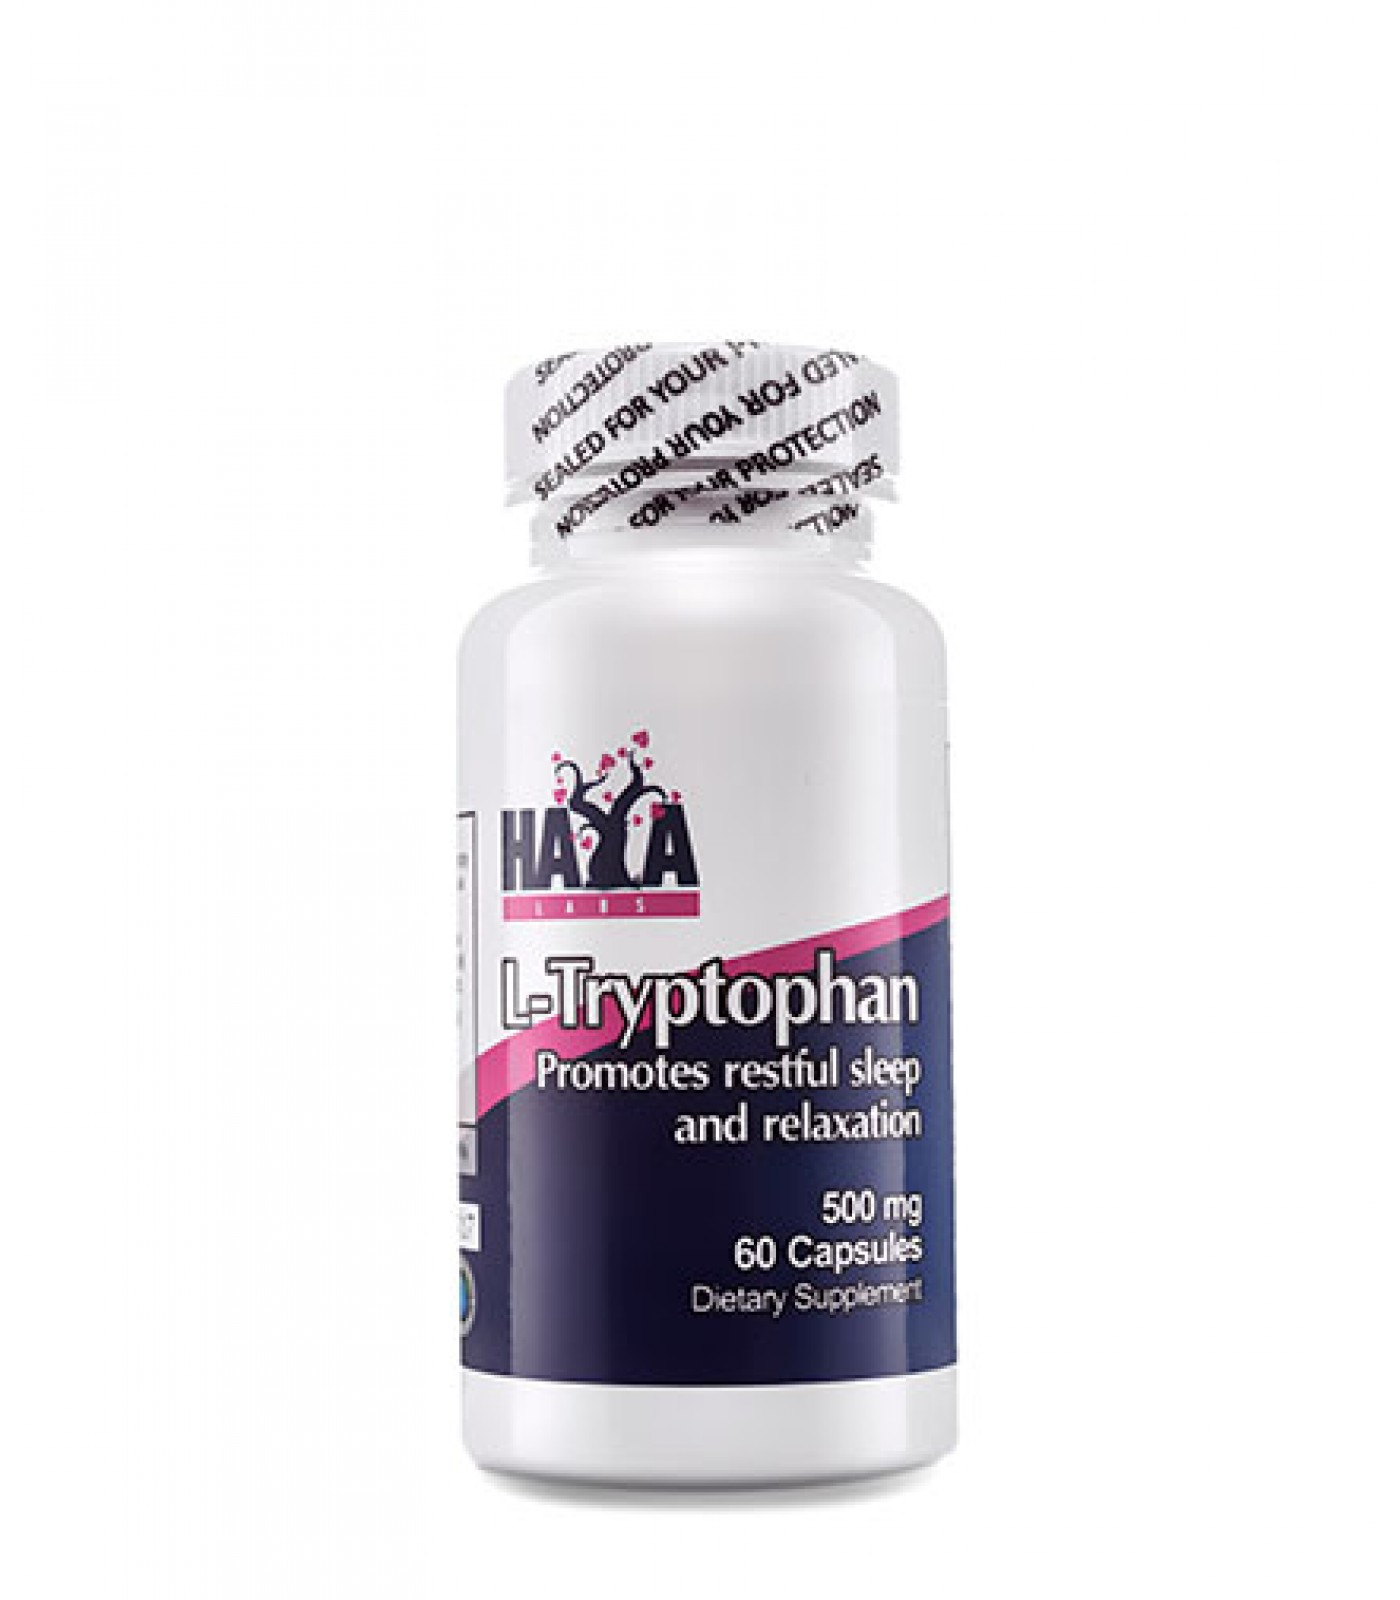 Haya Labs - L-Tryptophan 500mg. / 60 Caps